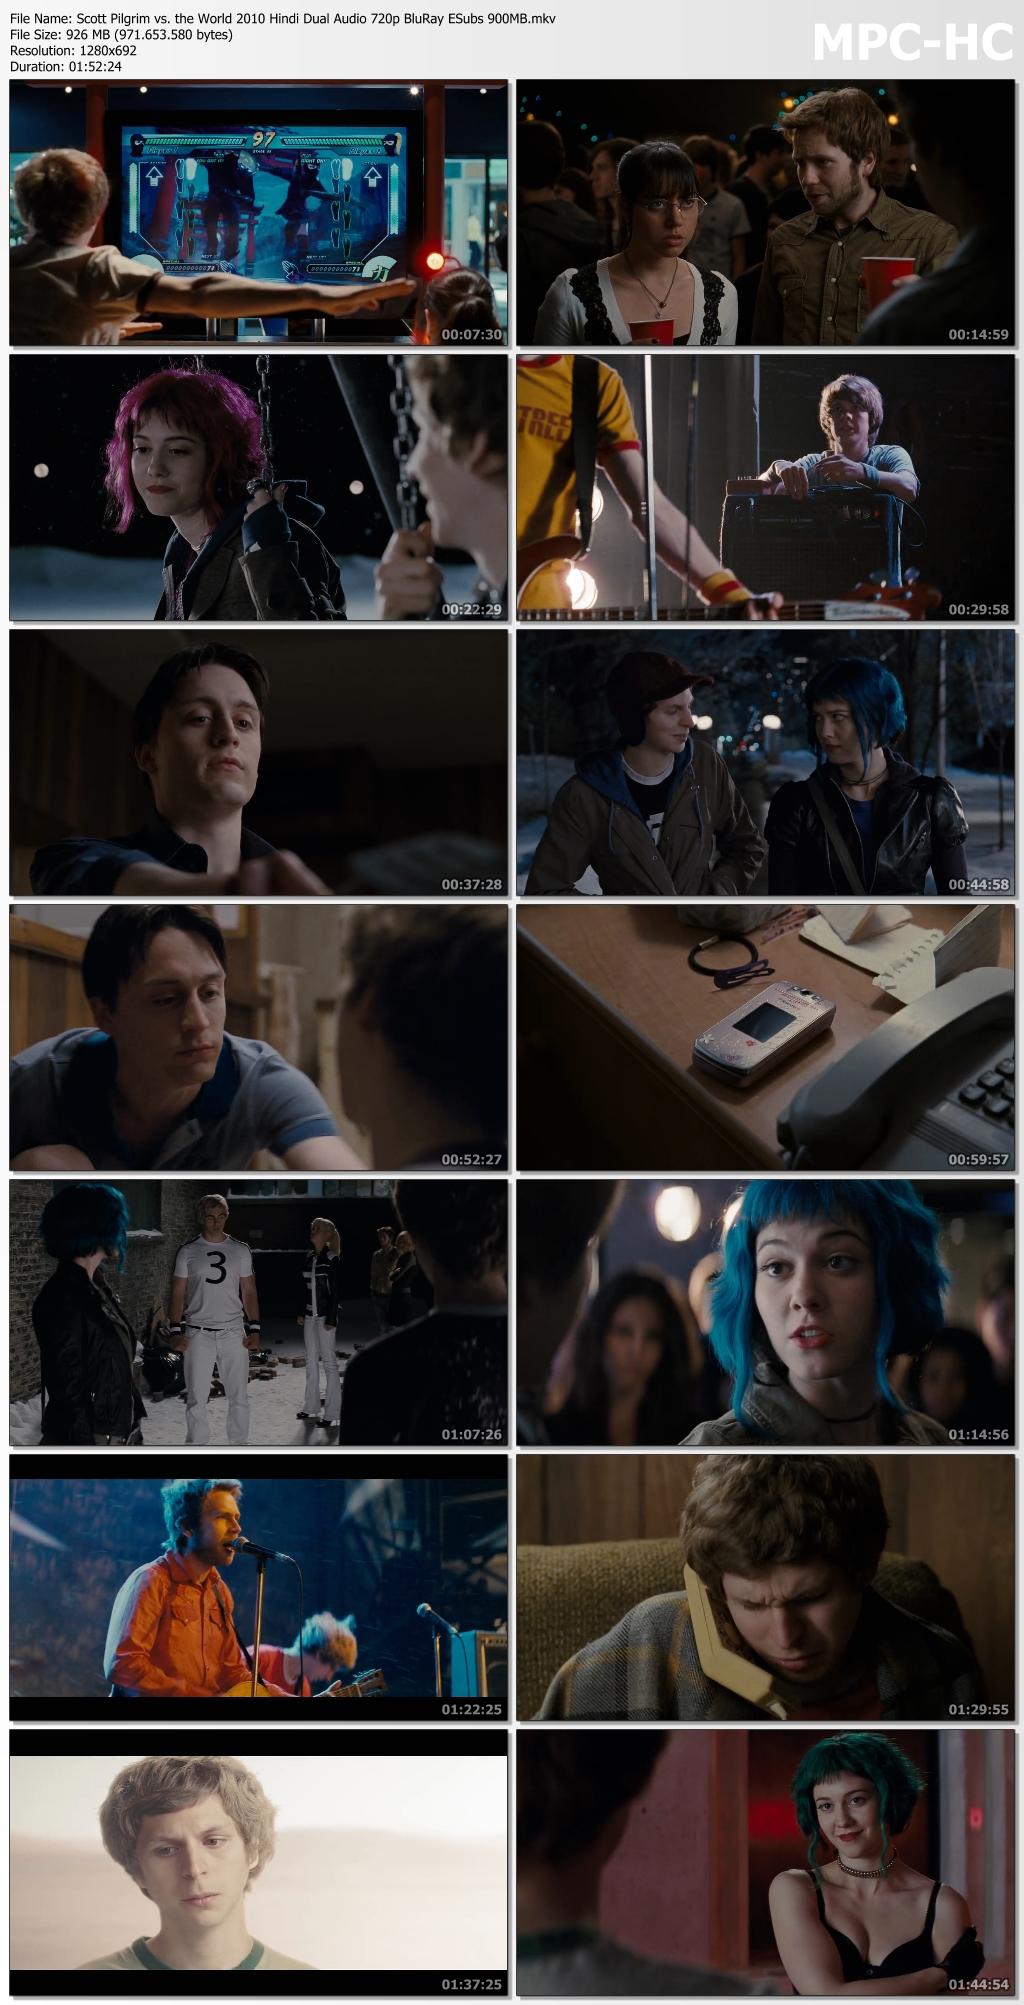 Scott-Pilgrim-vs-the-World-2010-Hindi-Dual-Audio-720p-Blu-Ray-ESubs-900-MB-mkv-thumbs